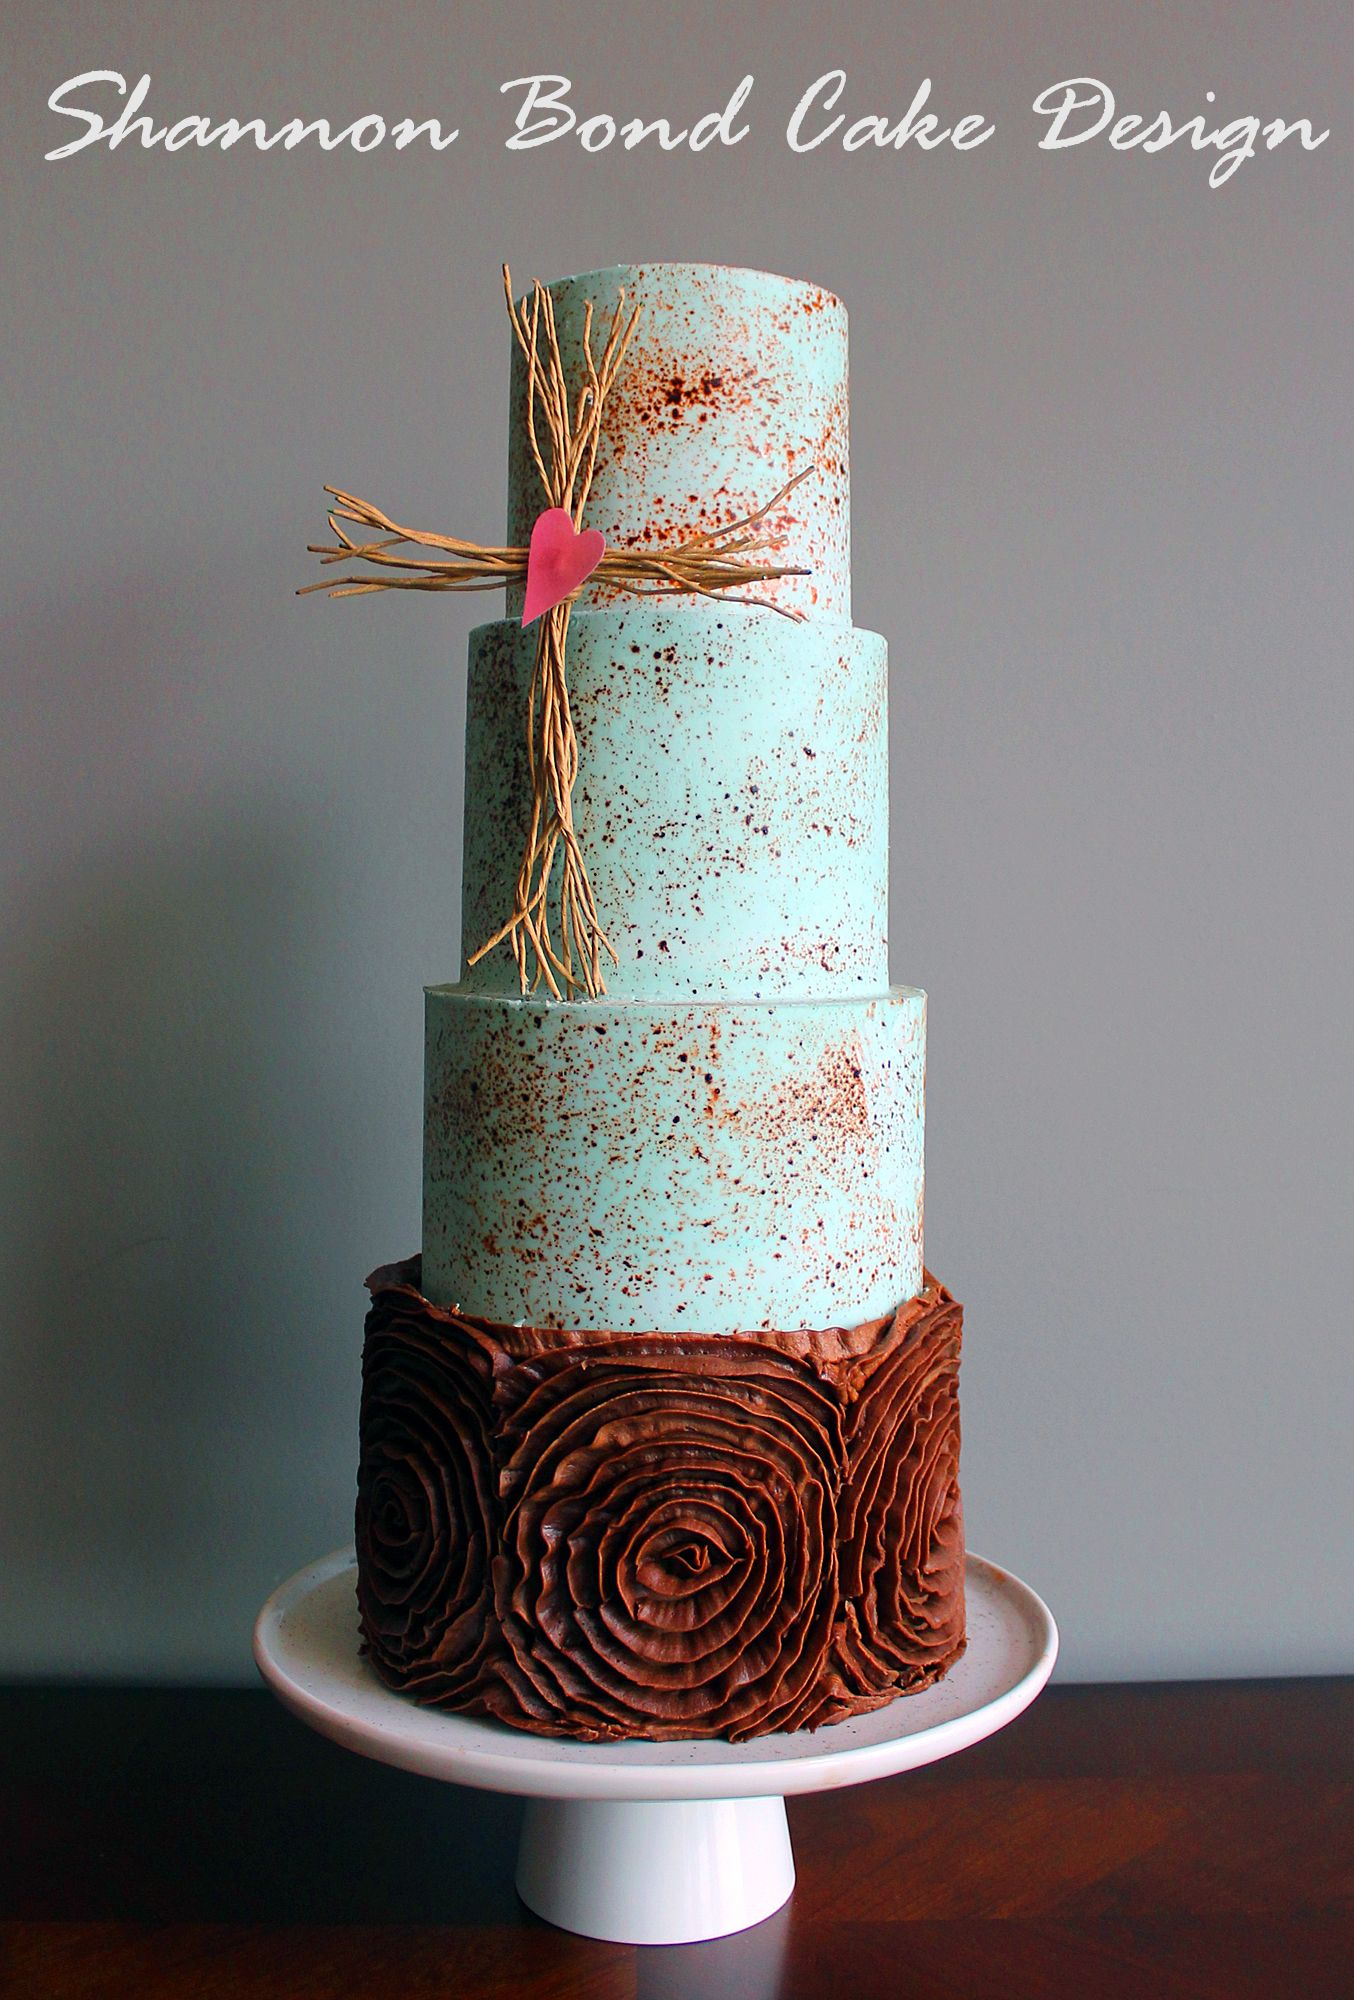 Awesome Easter Cake / Shannon Bond Cake Design/ Www.sbcakedesign.com / Kansas City.  Beautiful Wedding ...